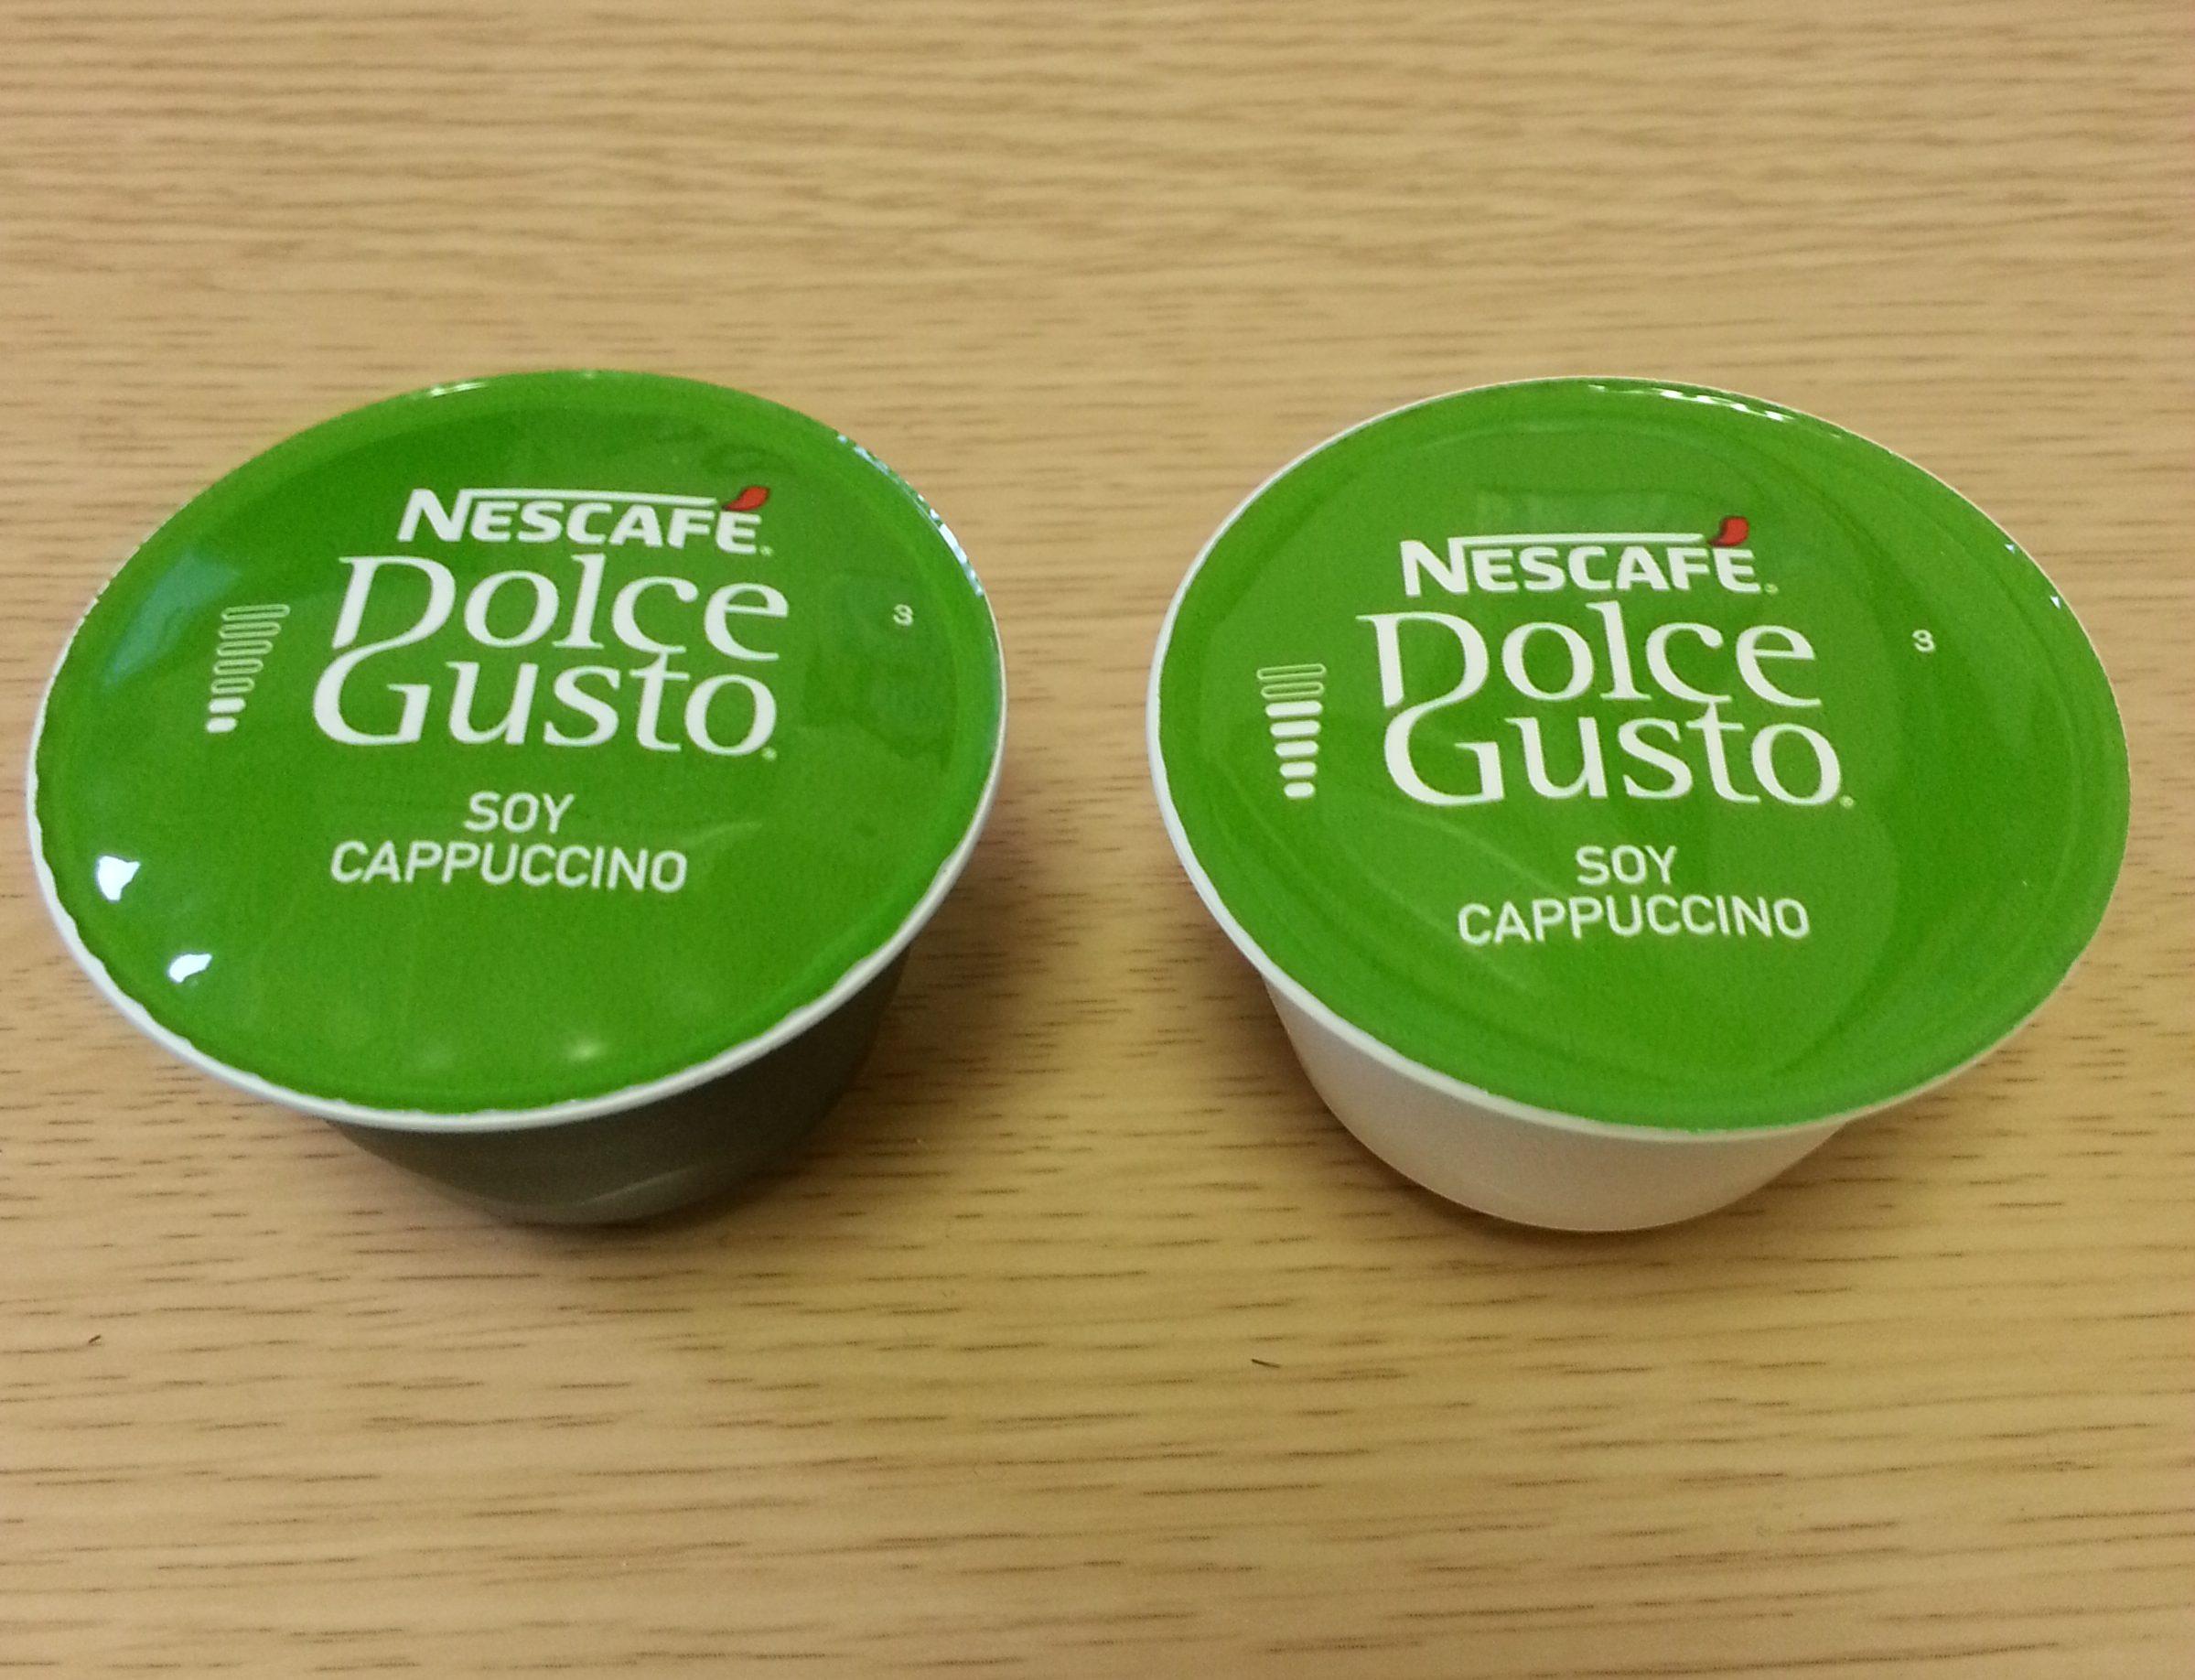 nescafe-dolcegusto-soylatte1